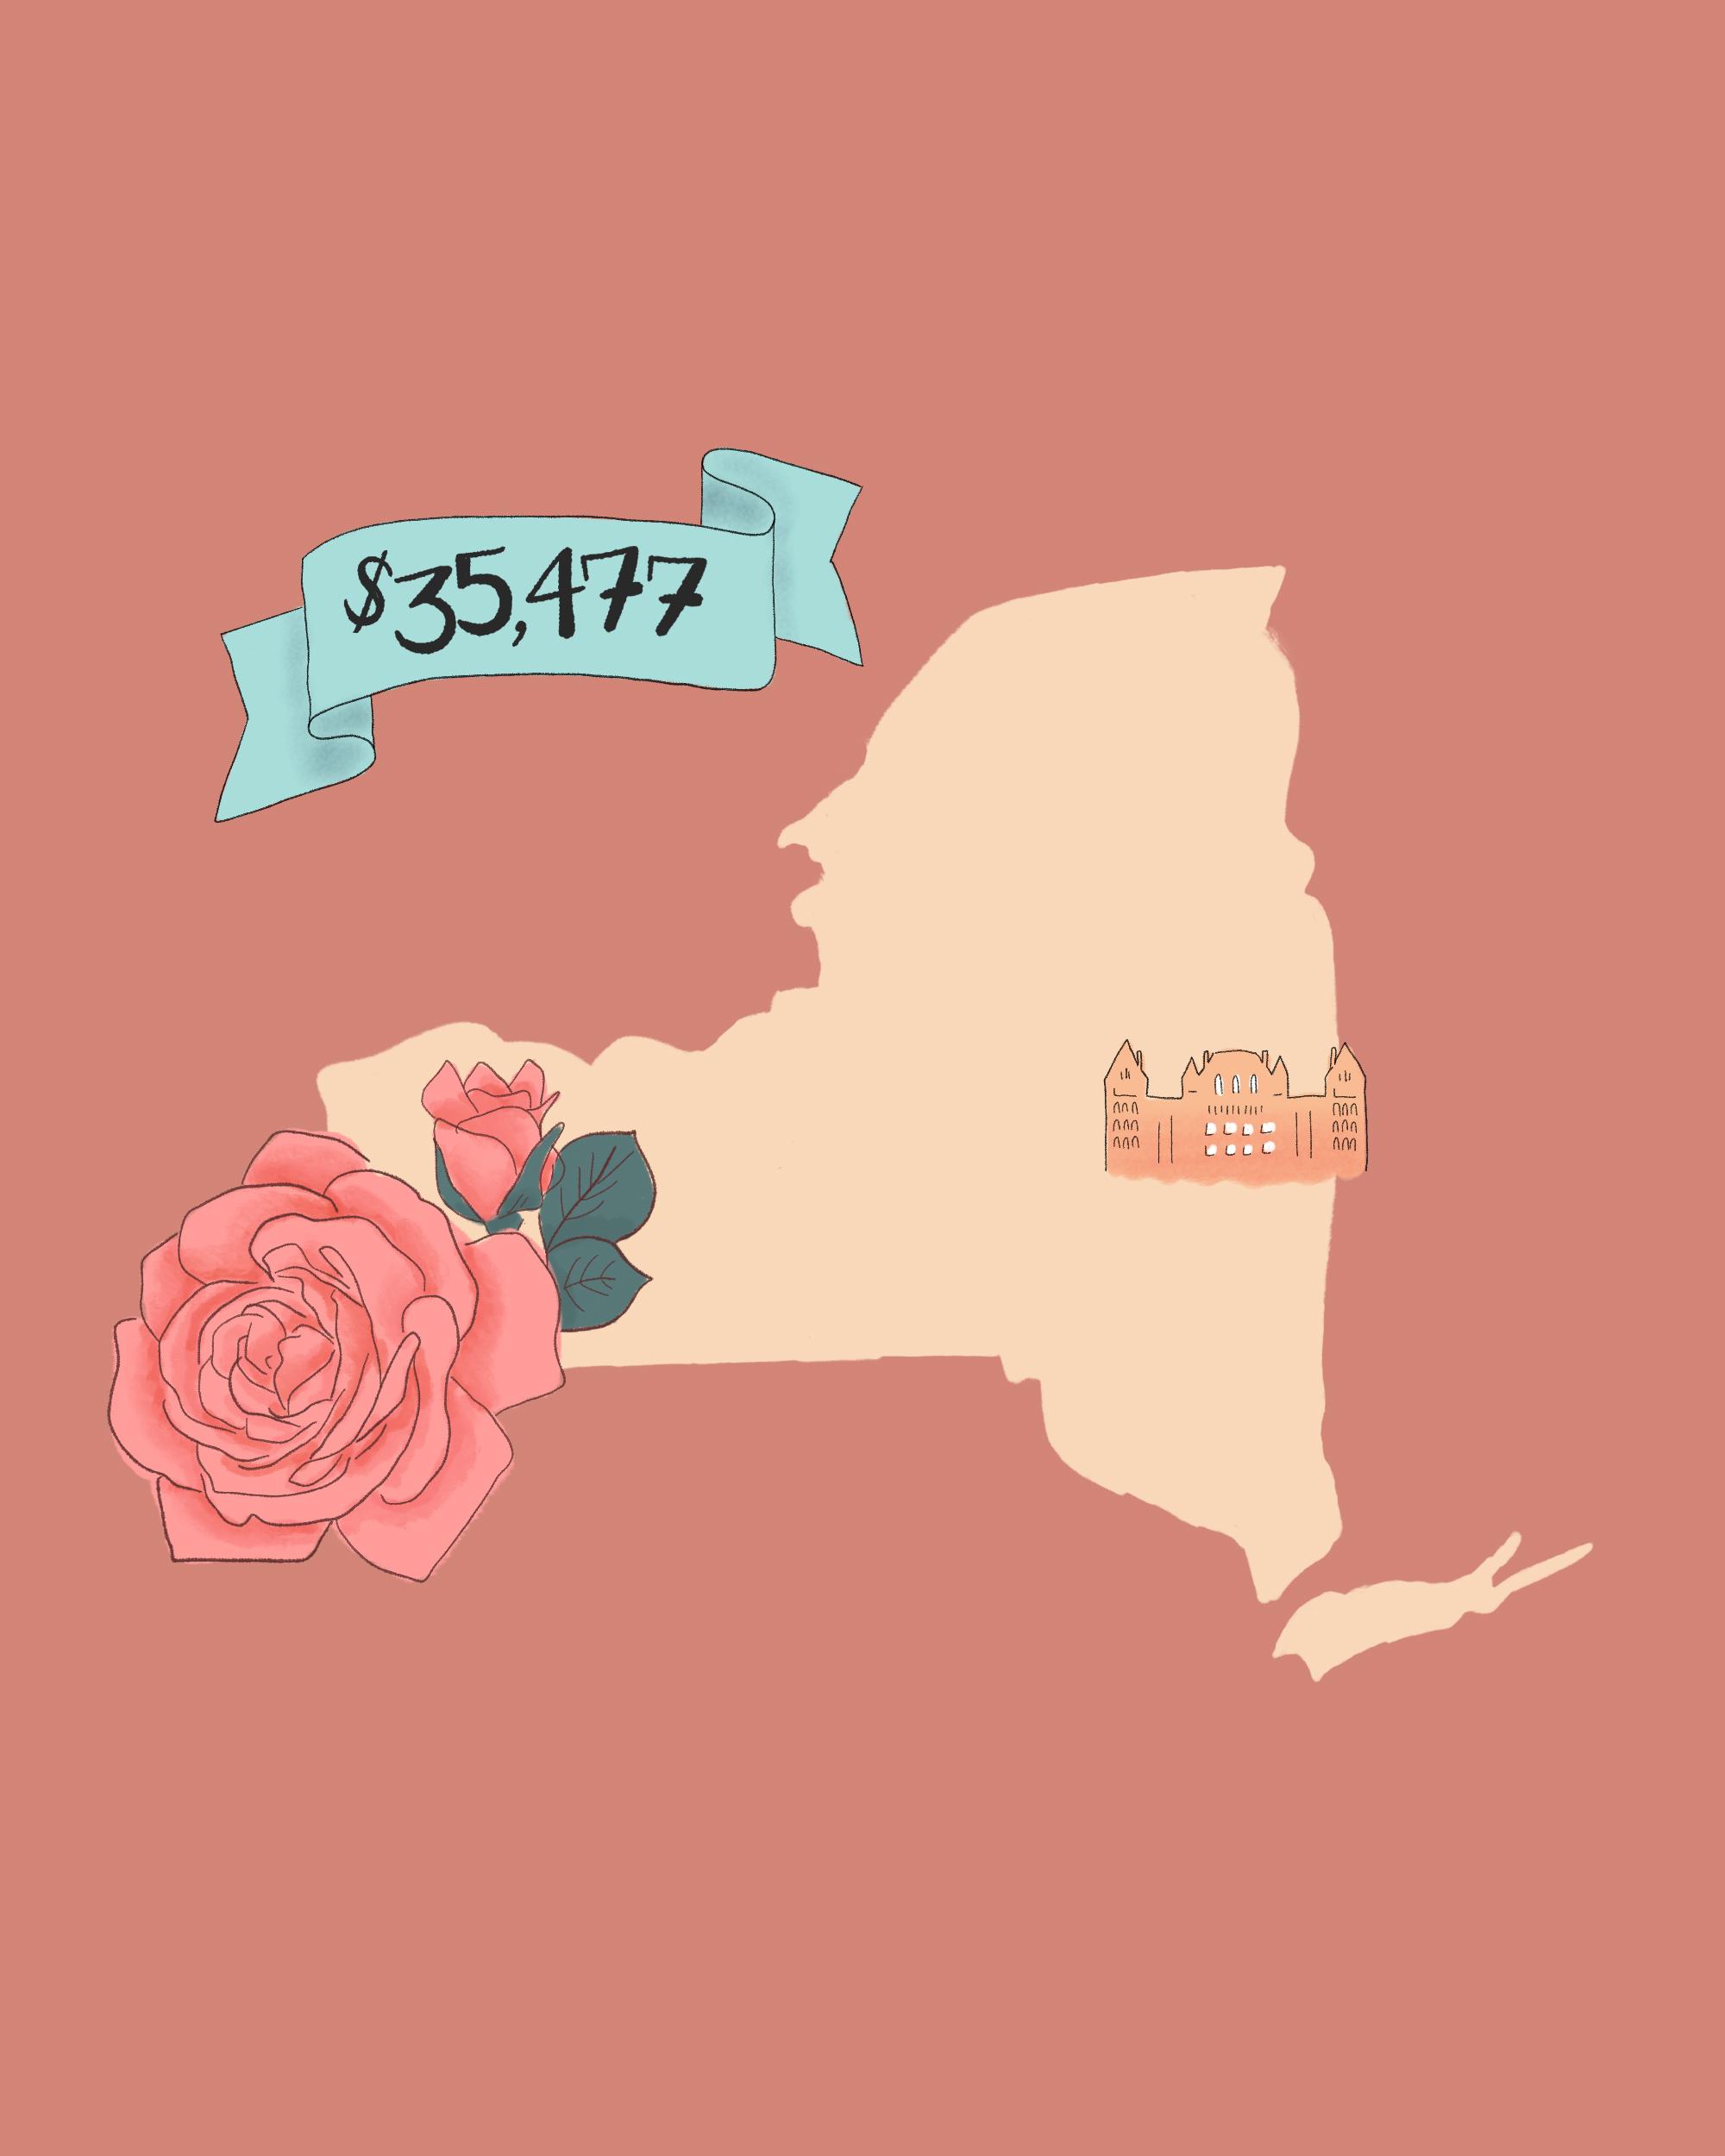 state wedding costs illustration new york